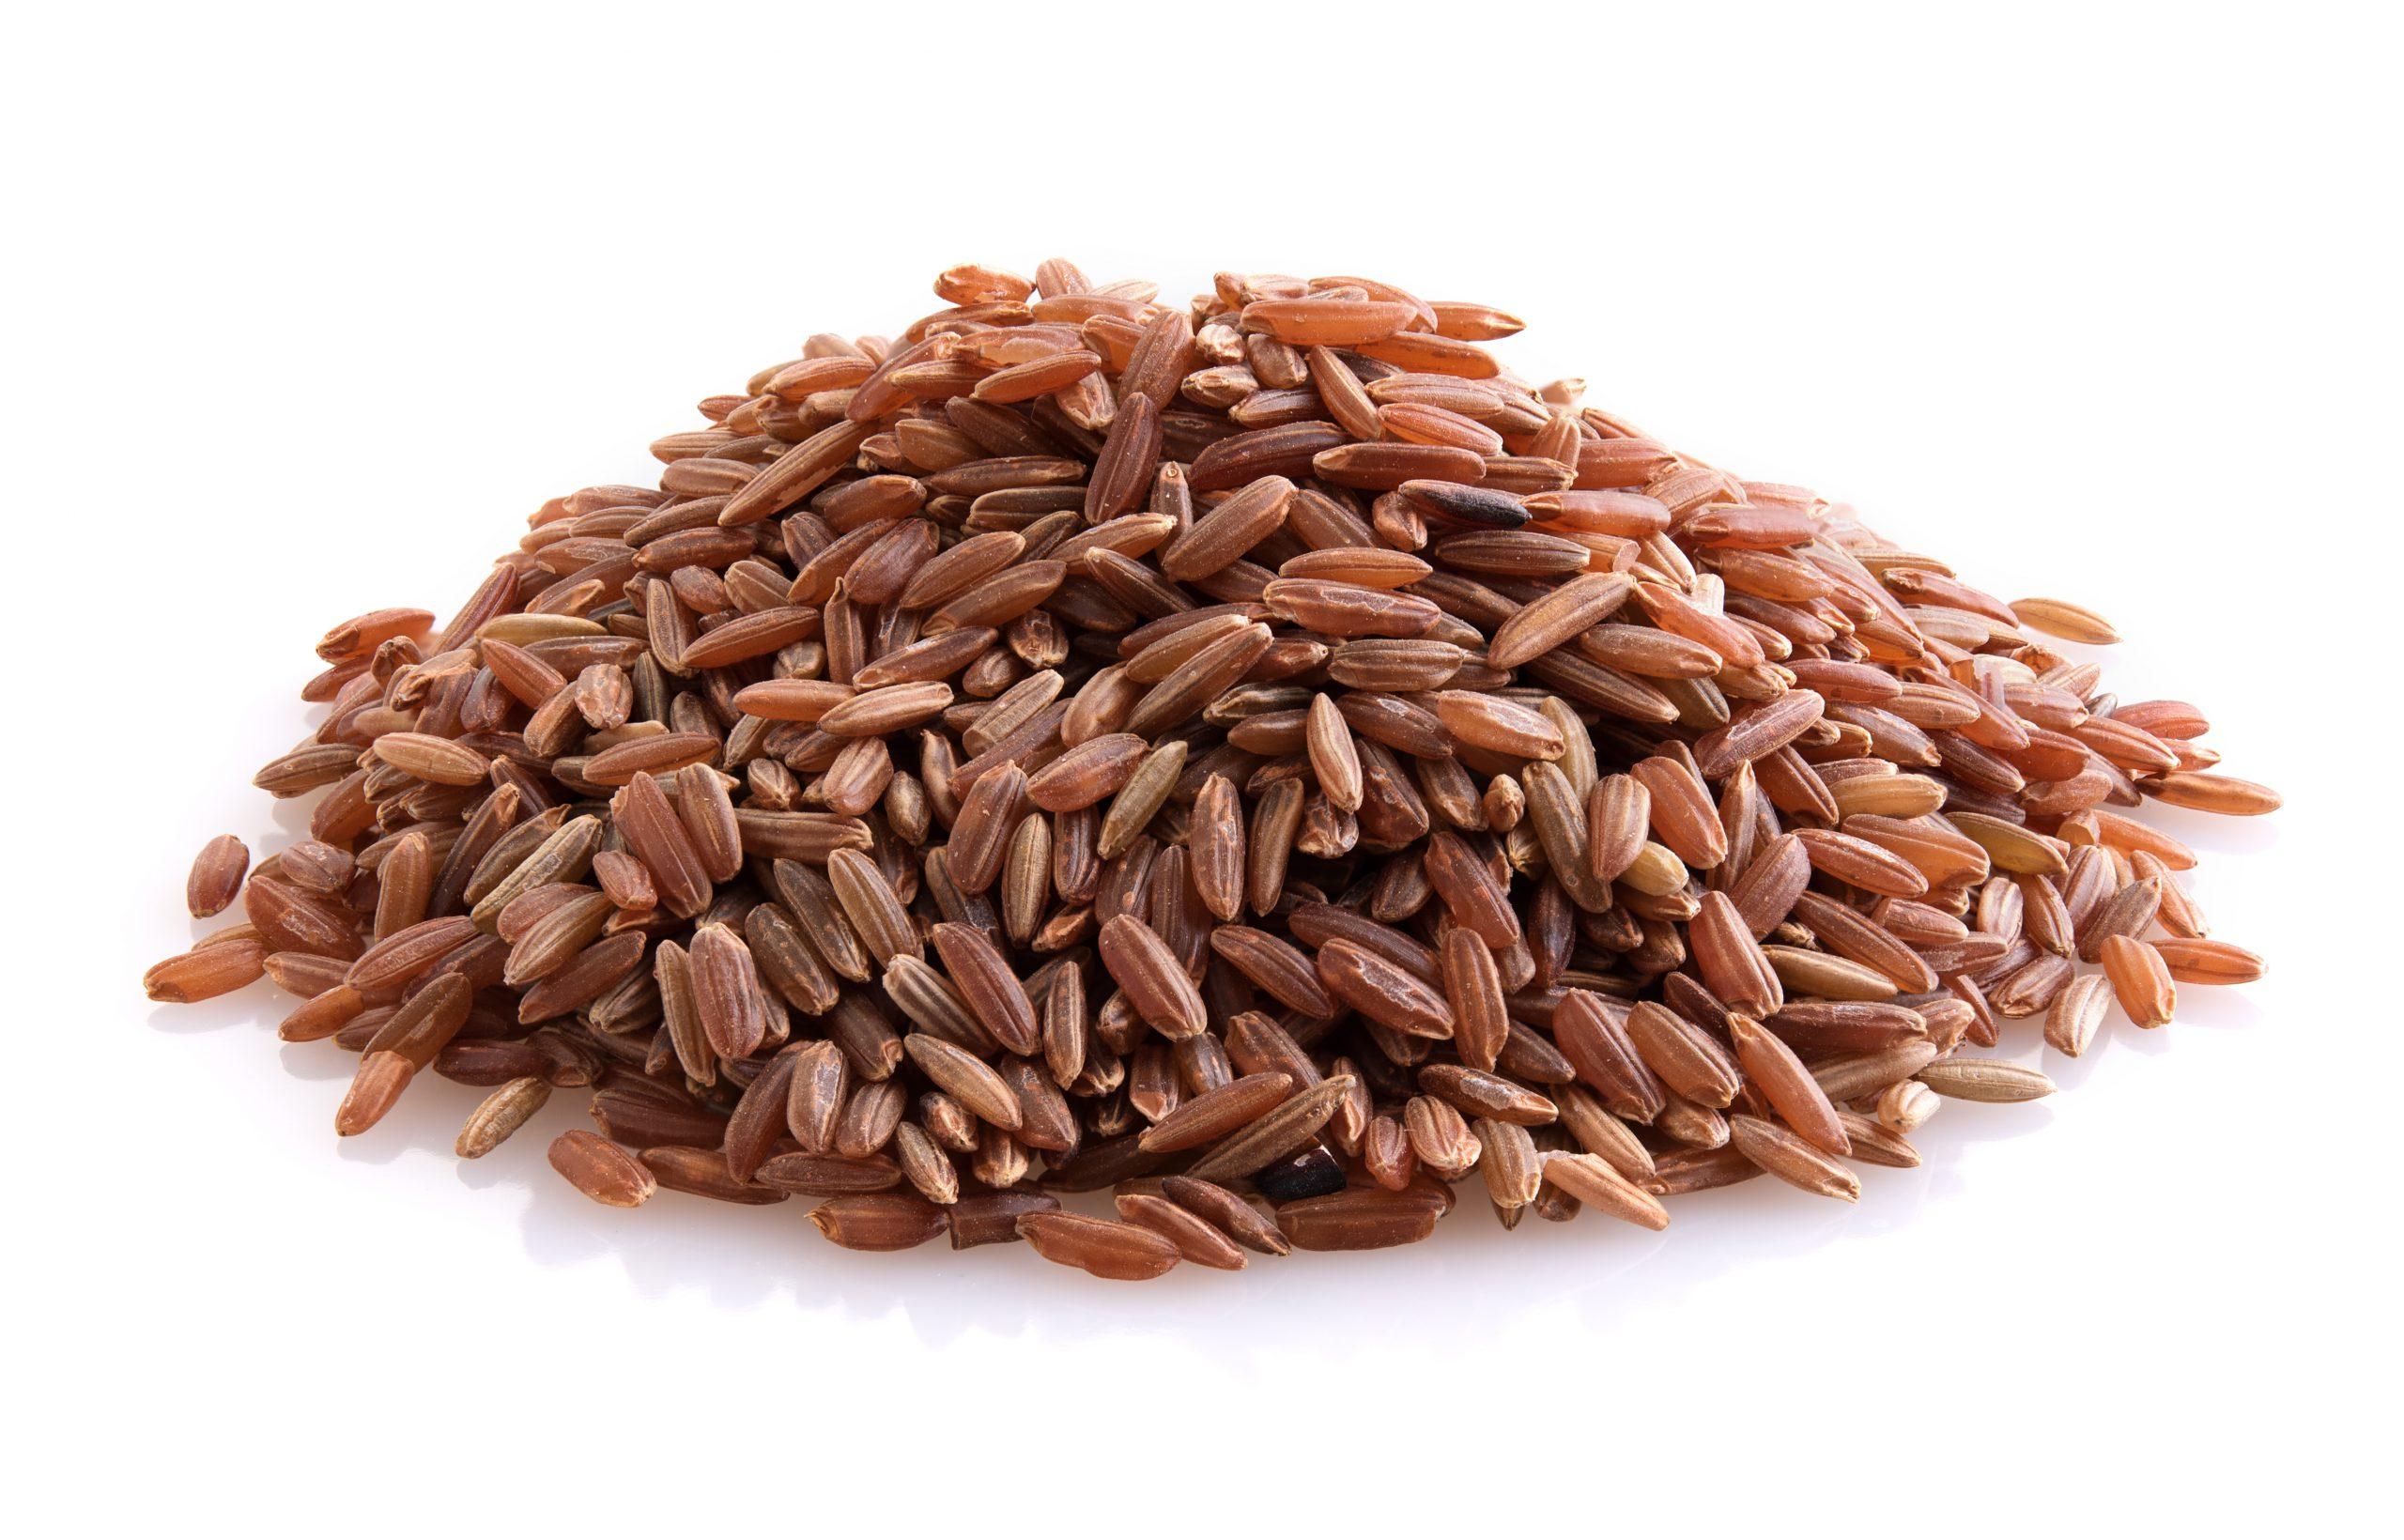 Brown Rice Protein (โปรตีนจากข้าวกล้อง)